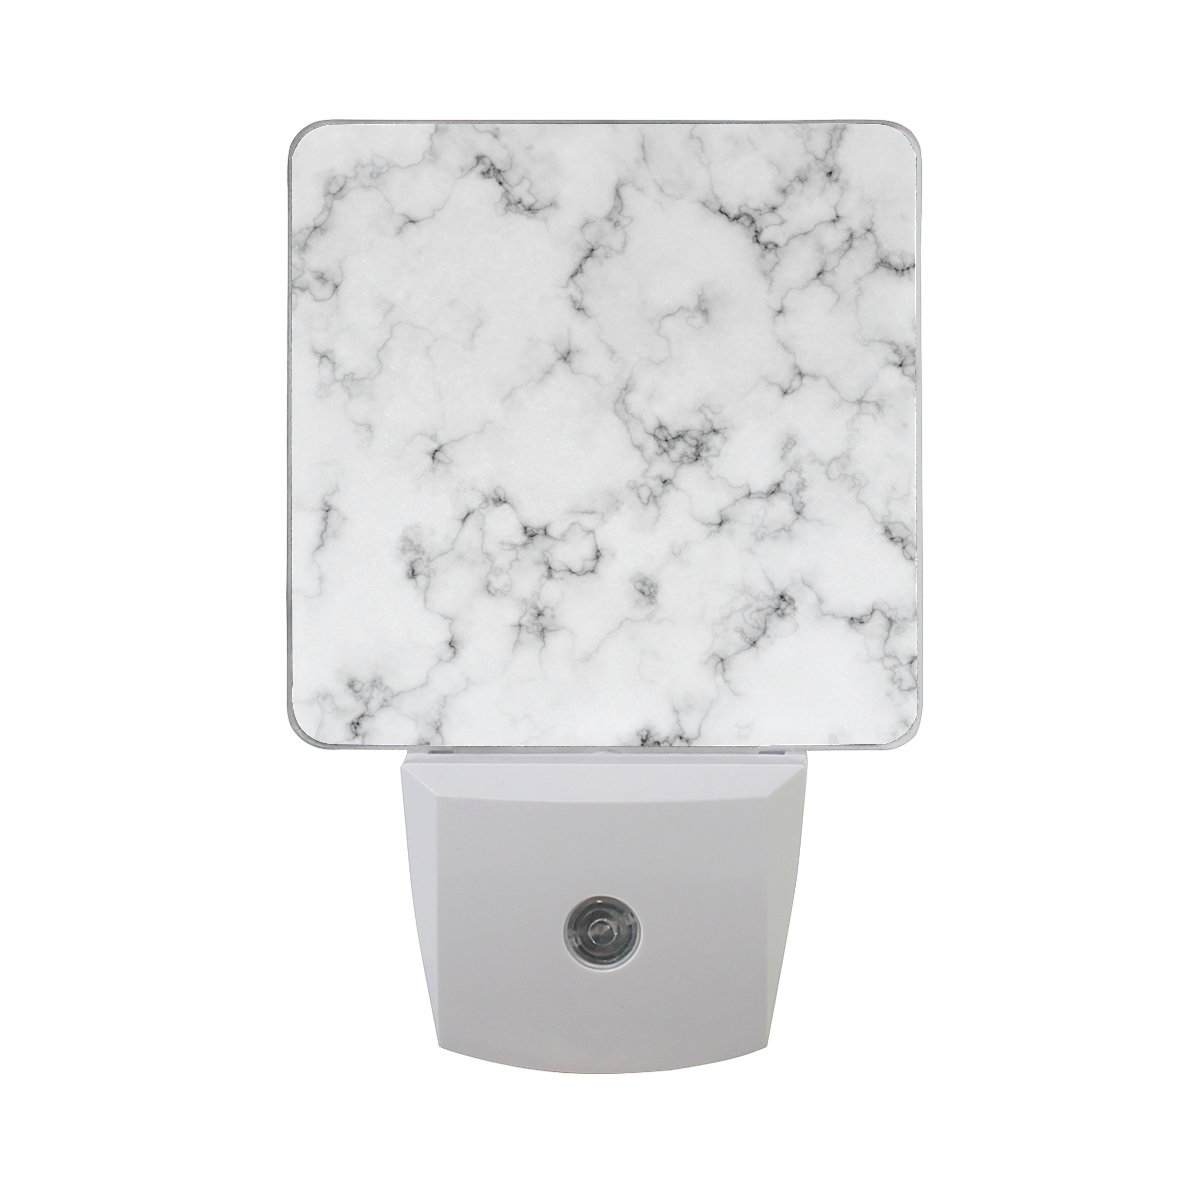 Plug-in LED Night Light Lamp White Marble Luxury Printing with Dusk to Dawn Sensor for Bedroom, Bathroom, Hallway, Stairways, 0.5W-2 Pack